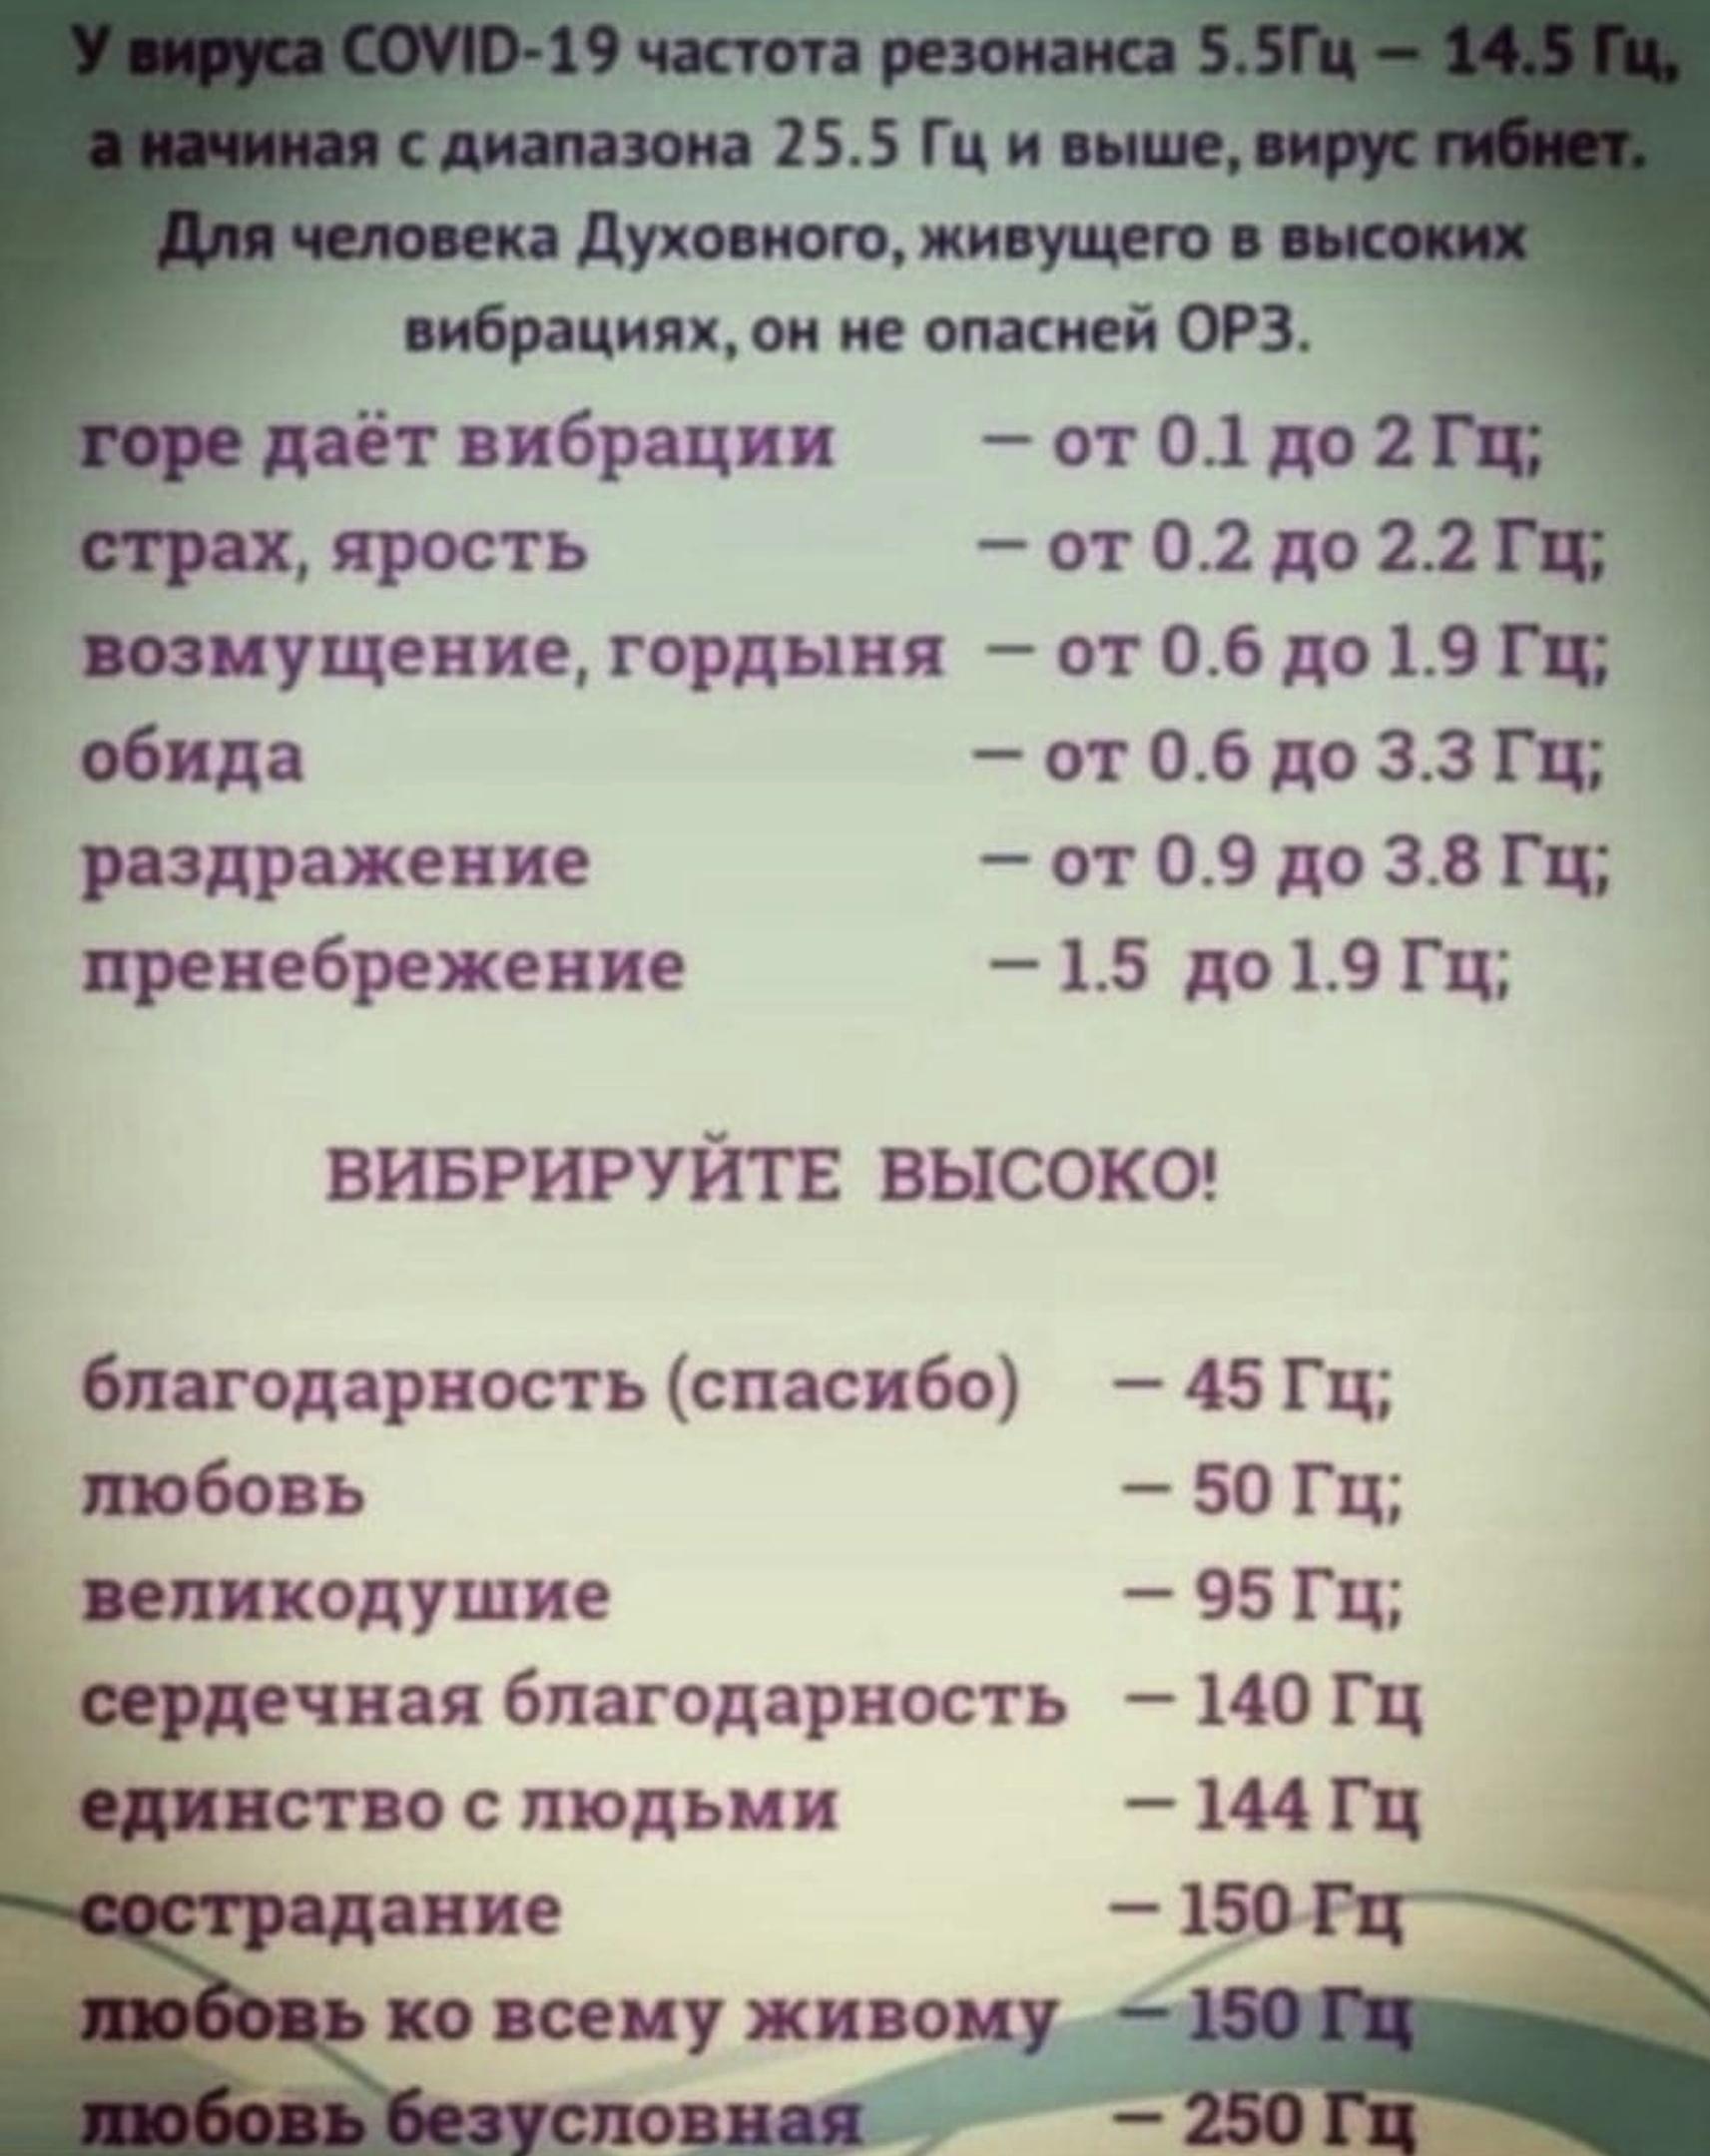 https://ltdfoto.ru/images/2020/11/21/9RoStfkzRus.jpgsize1713x2160quality96proxy1sign070035d1e1693b7a6aea1700ce3f8b8d.jpg